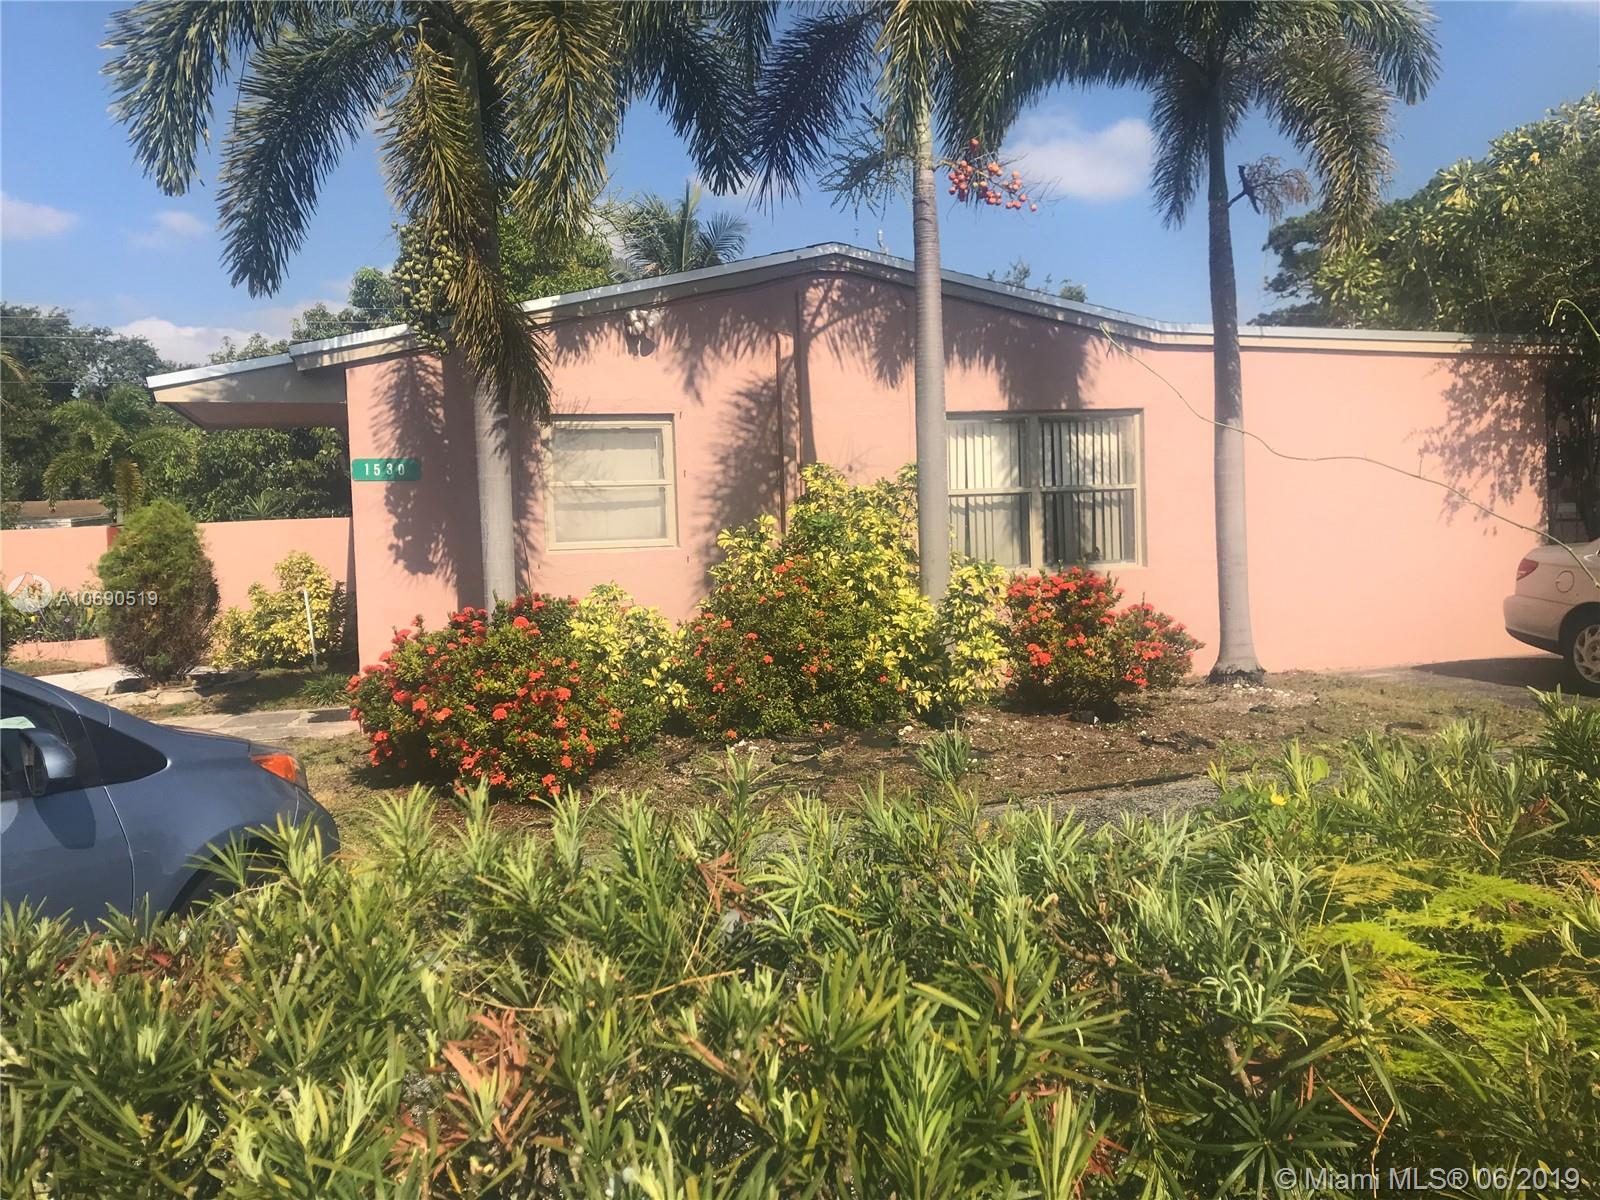 1530 N 71st Ter, Hollywood, FL 33024 - Hollywood, FL real estate listing